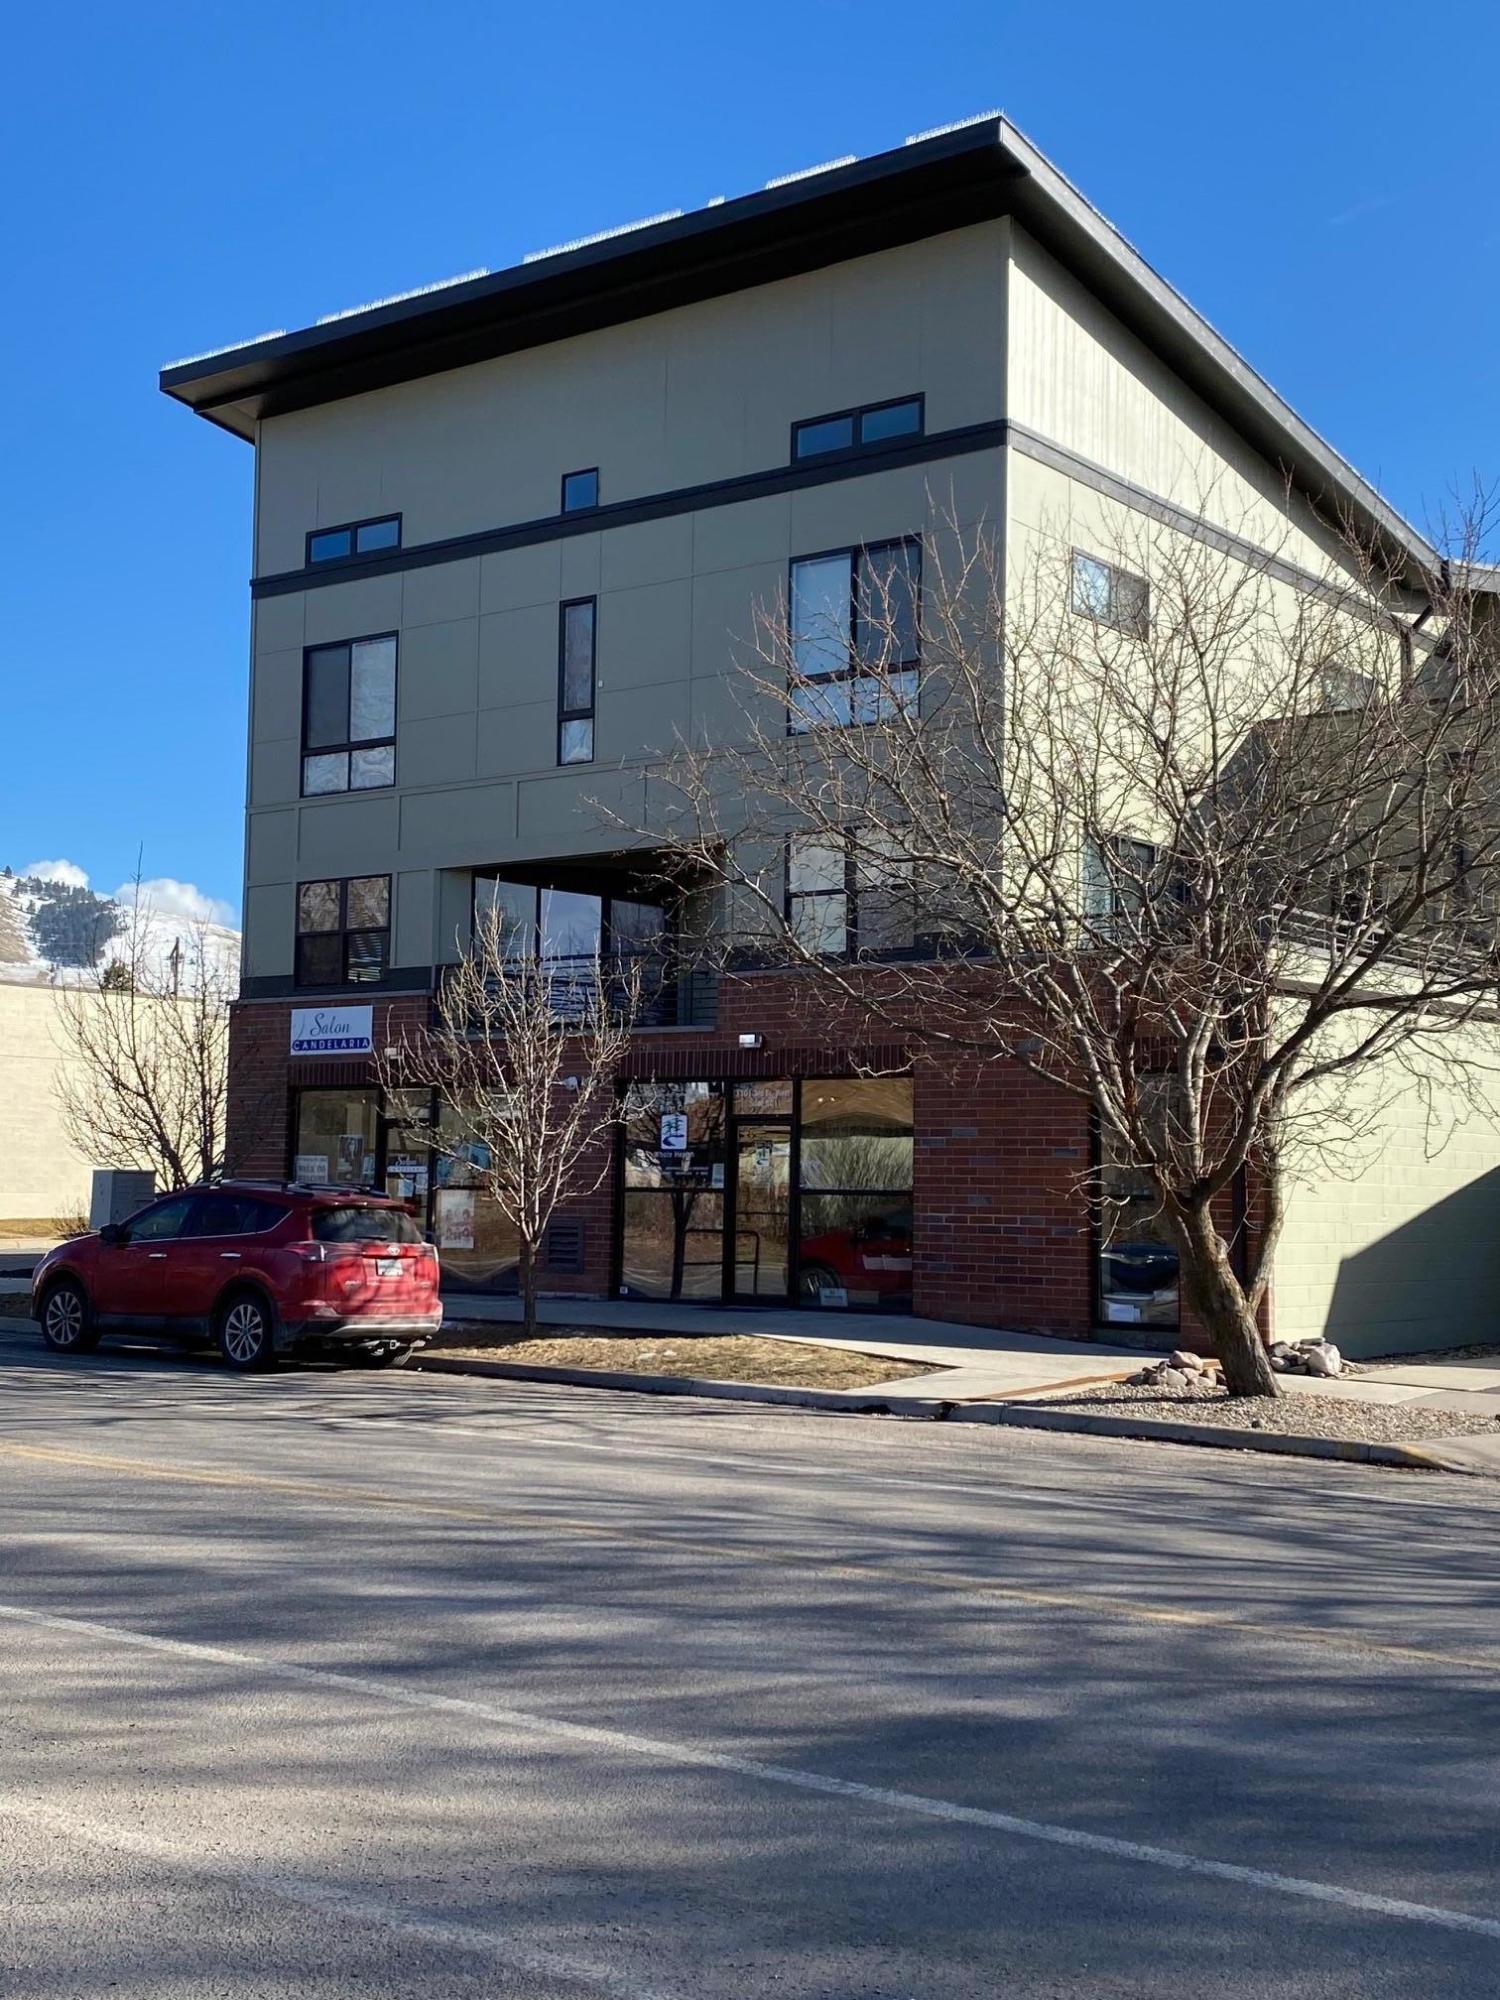 1101 South 3rd West Street, R2, Missoula, MT 59801